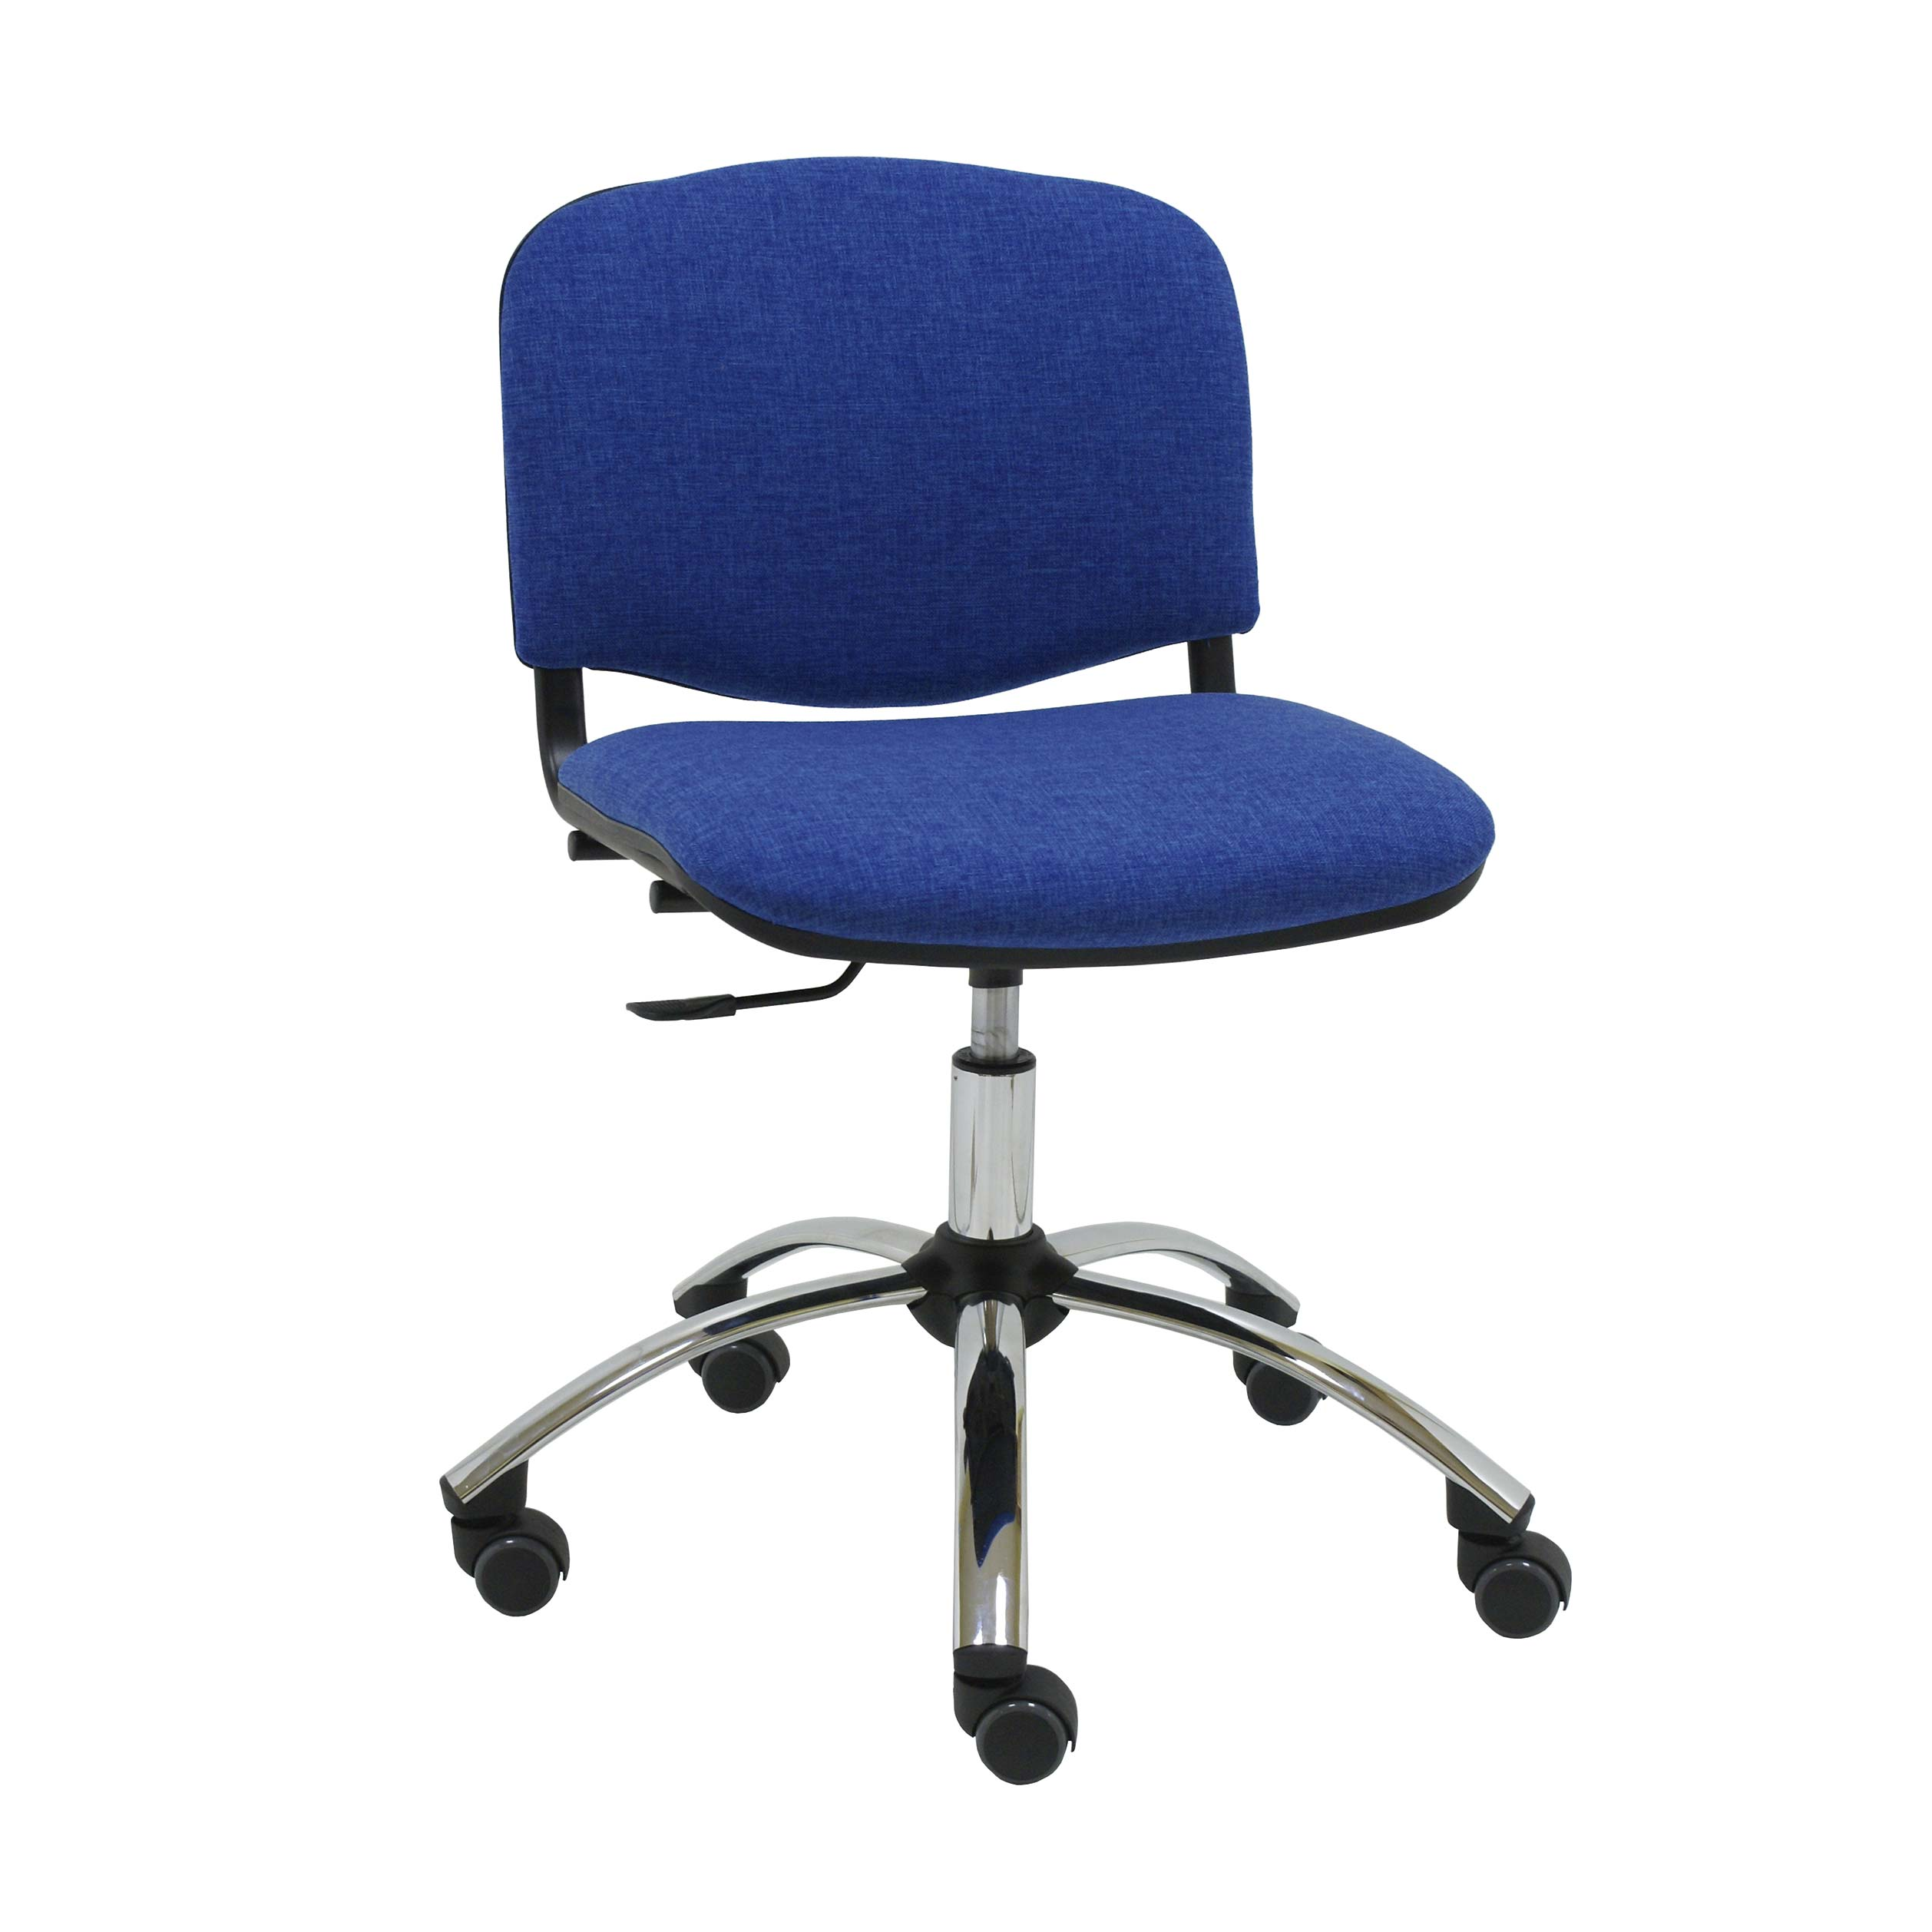 Silla giratoria iso una silla de escritorio ideal para for Sillas para trabajar